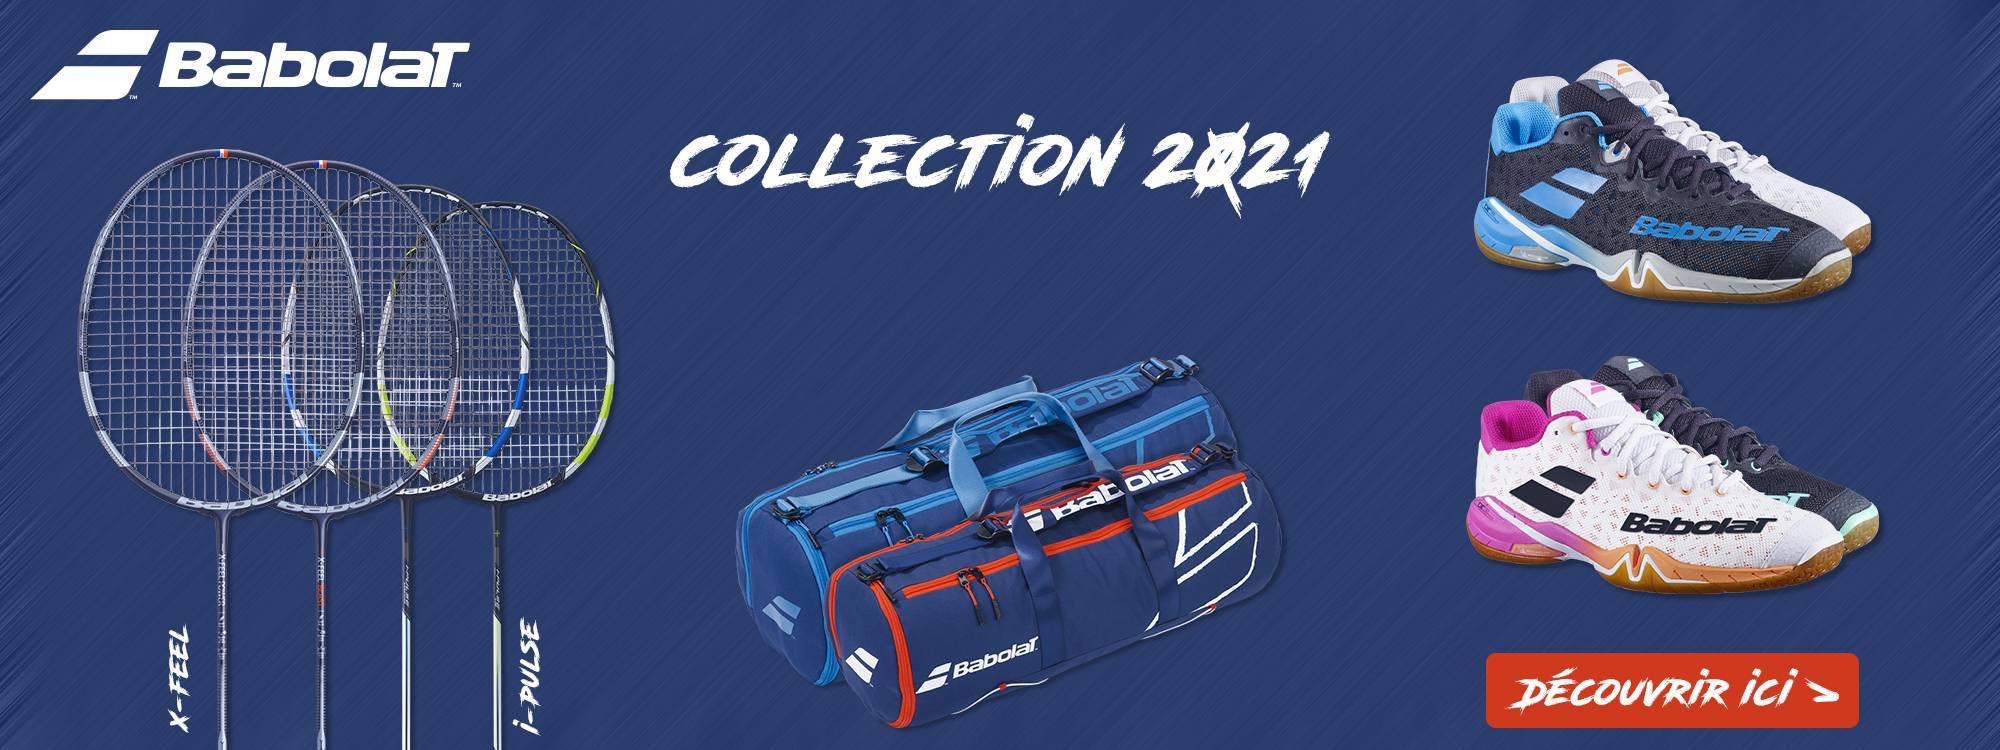 Babolat Badminton FW21